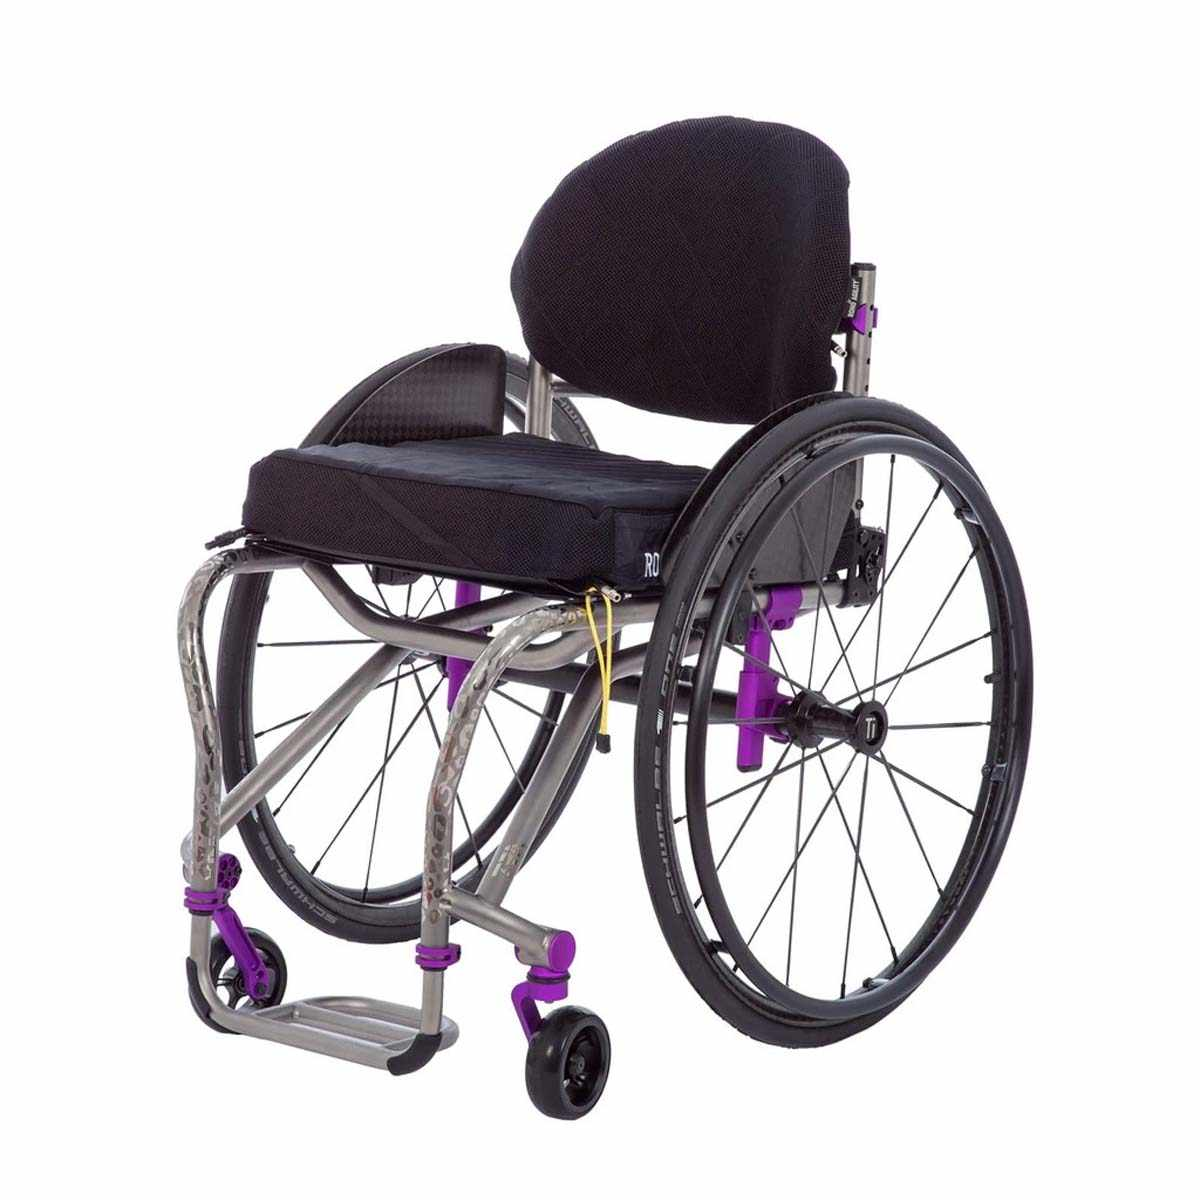 TiLite TRA rigid wheelchair